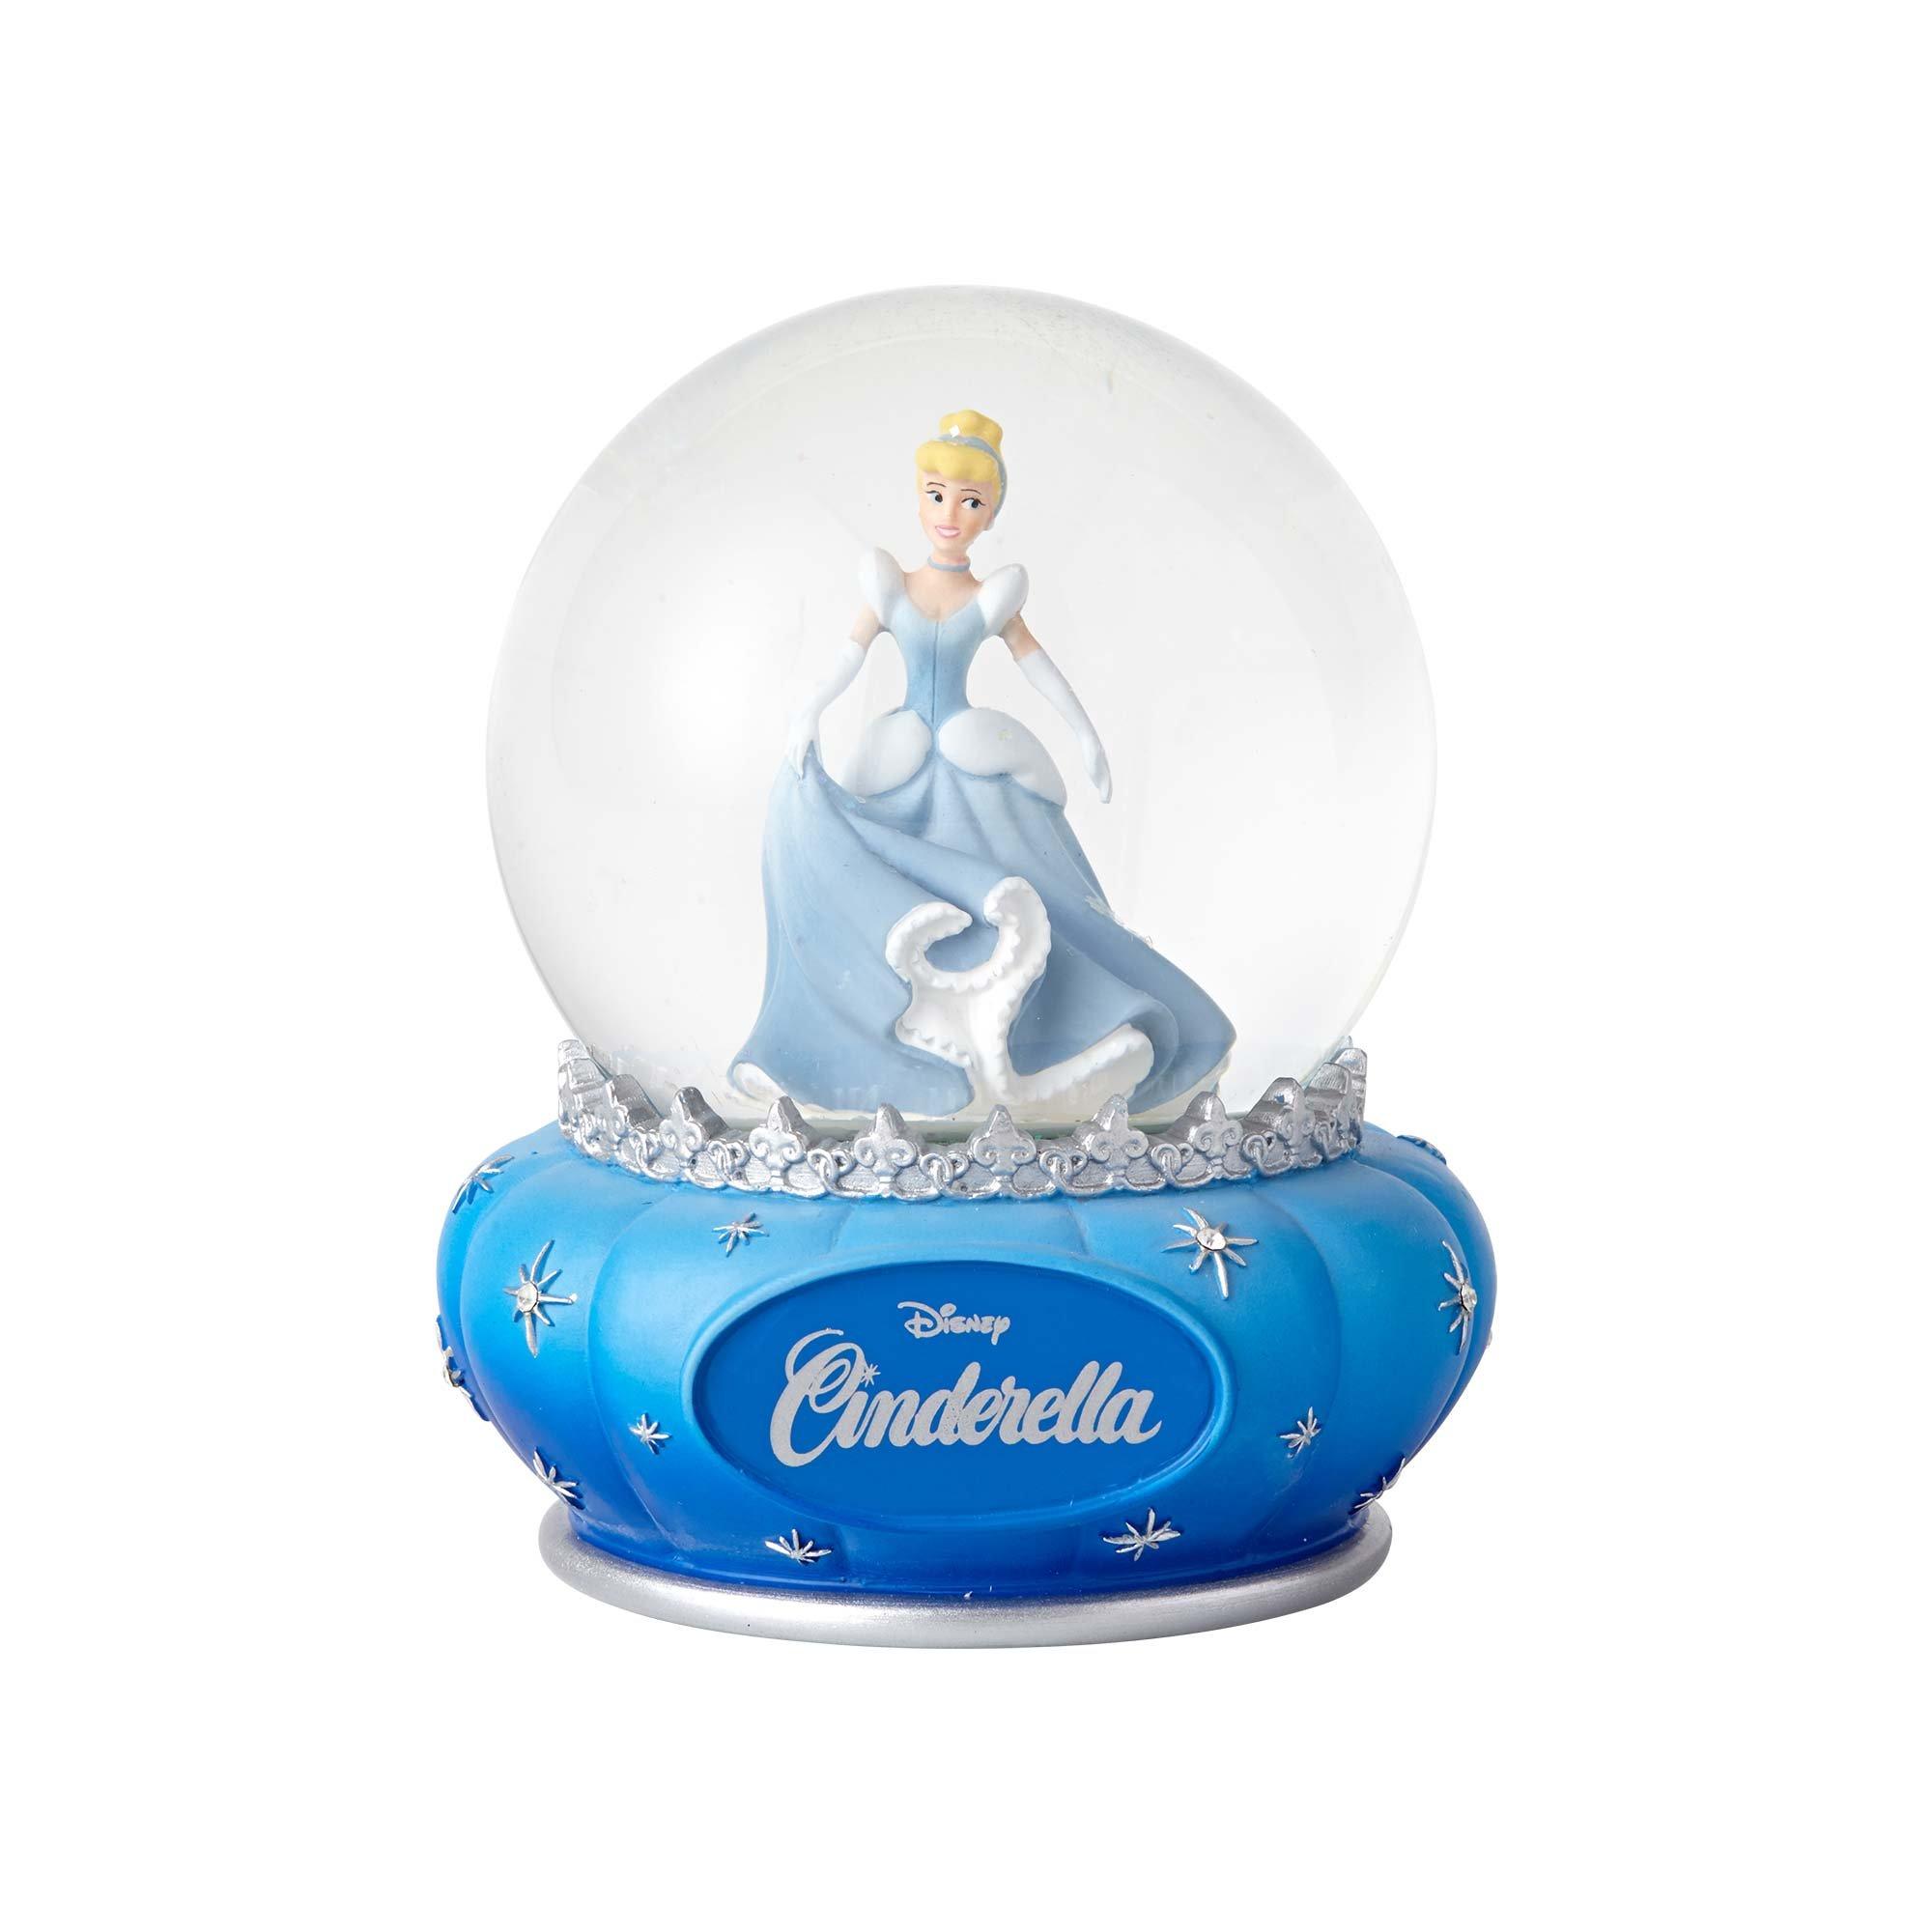 "Enesco Disney Showcase Cinderella, 5.5"" Stone Resin and Glass Waterball"